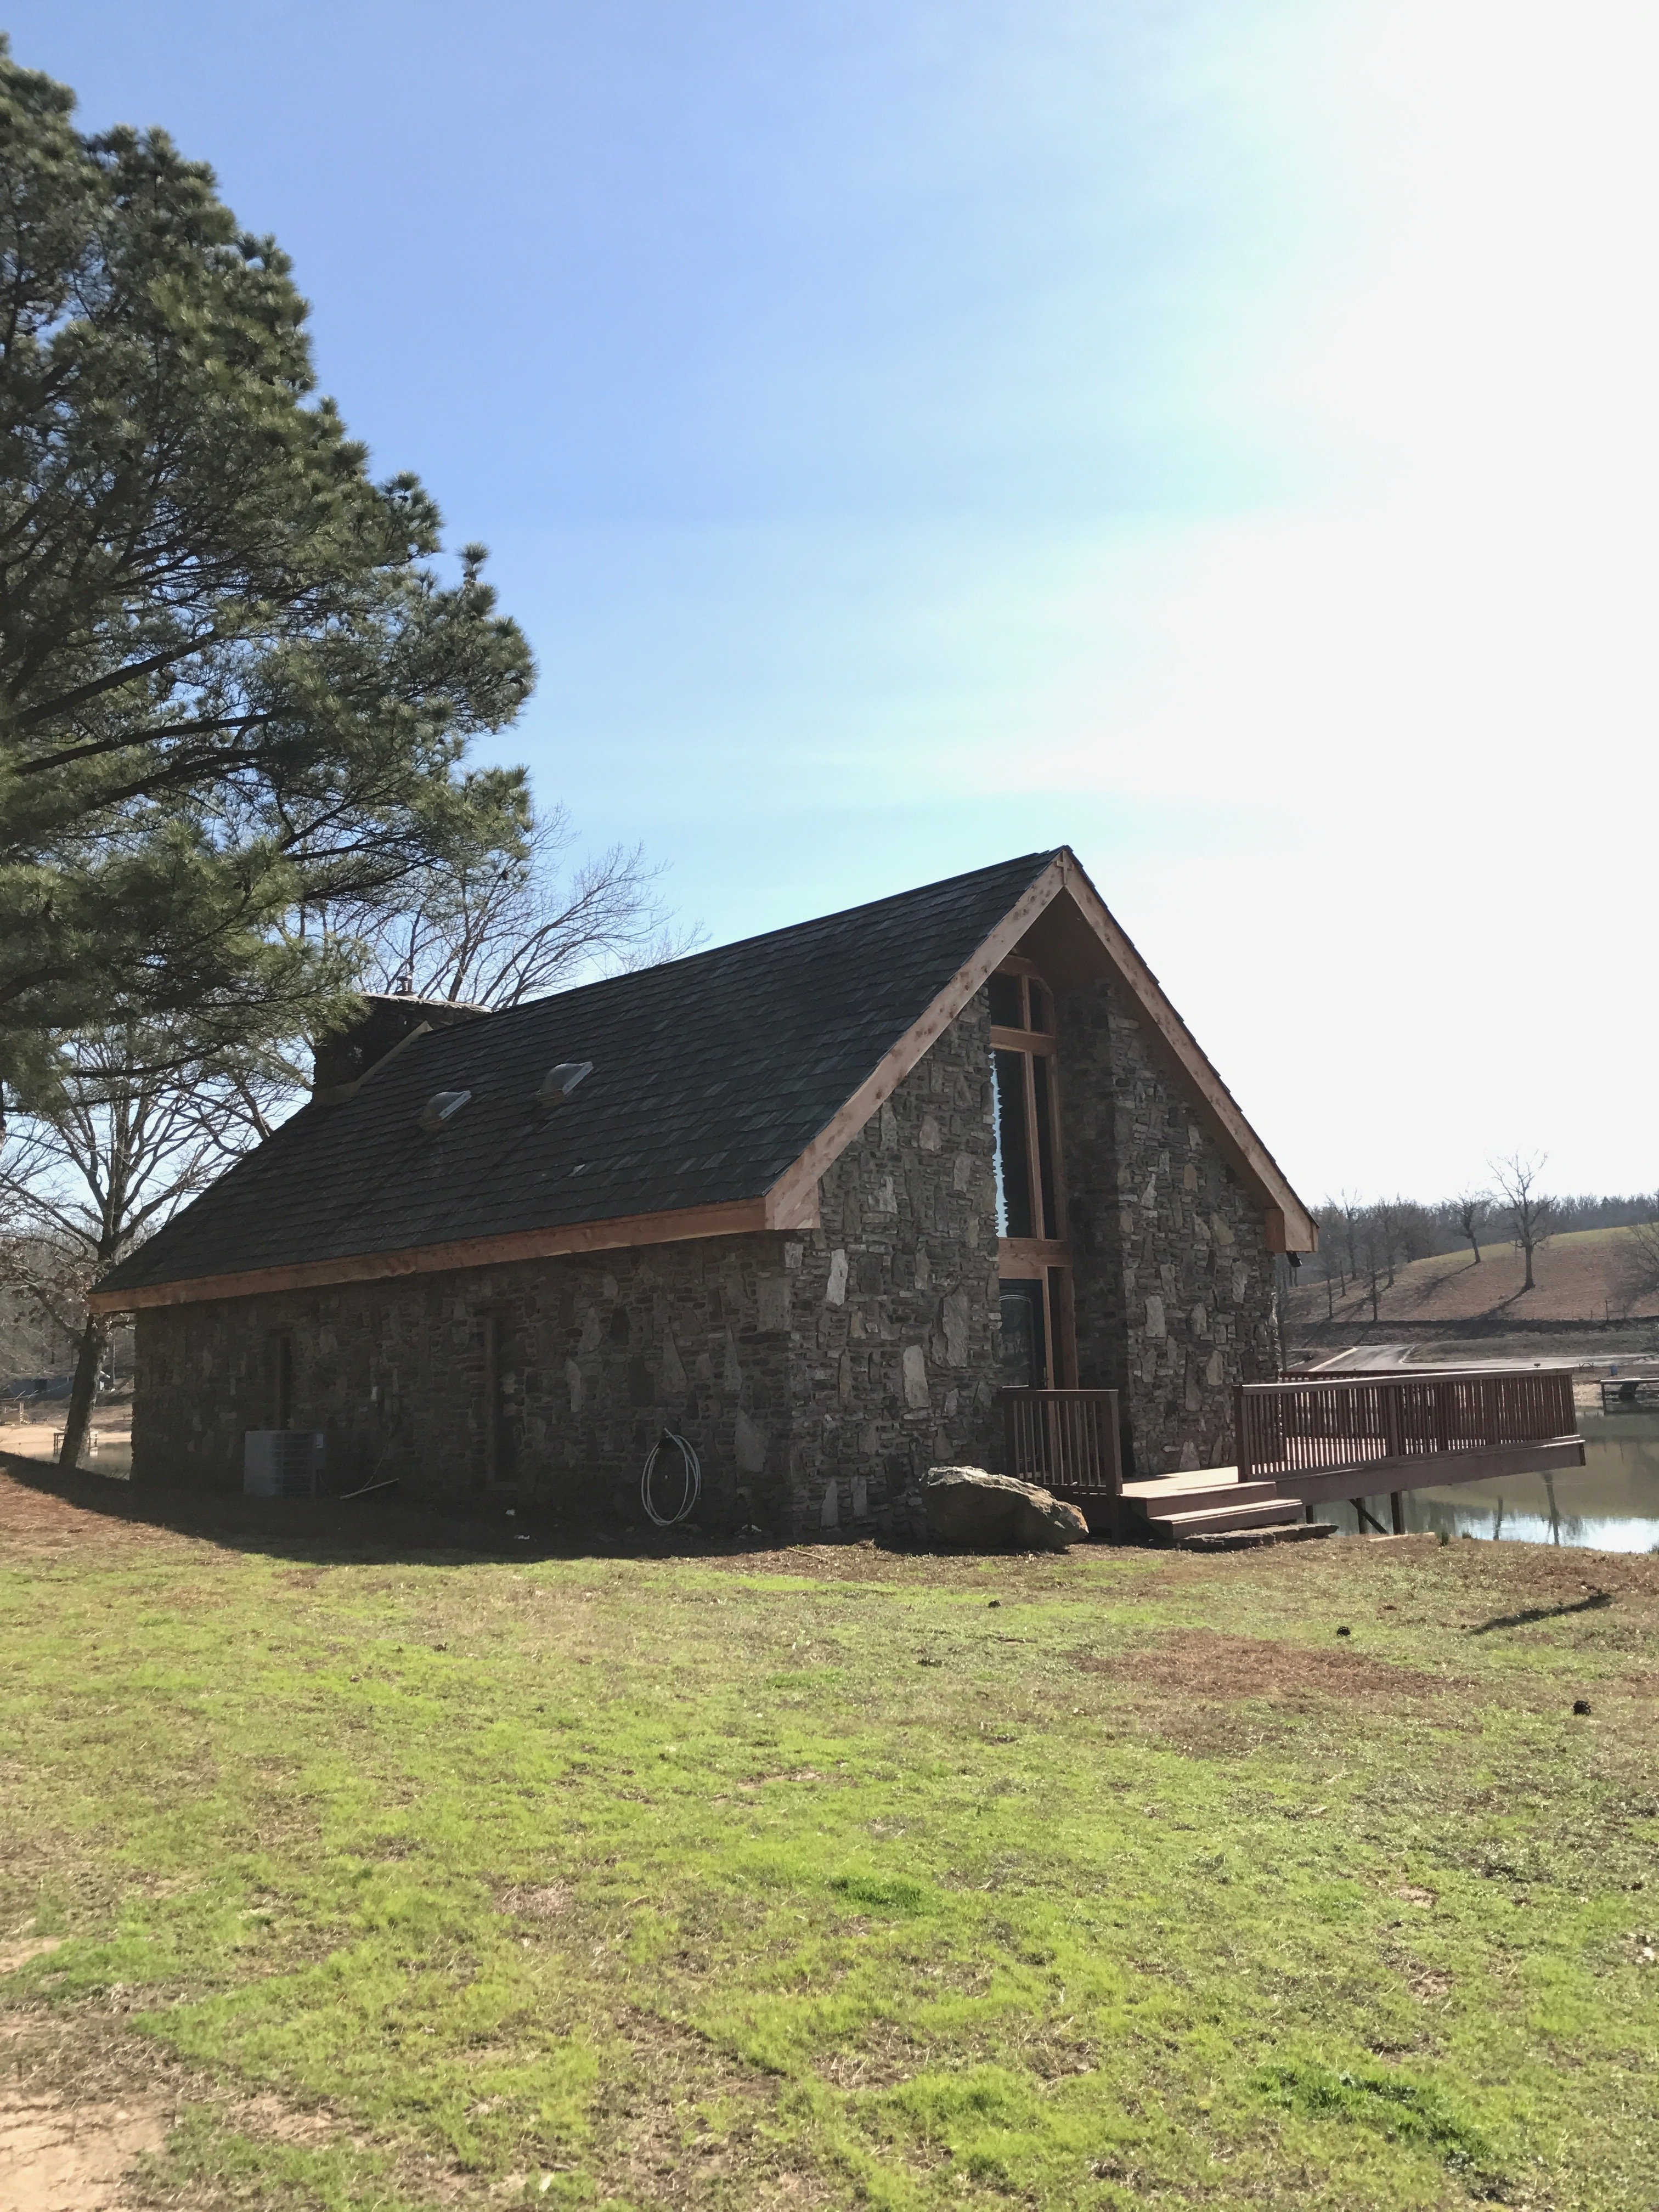 cabins in arkansas